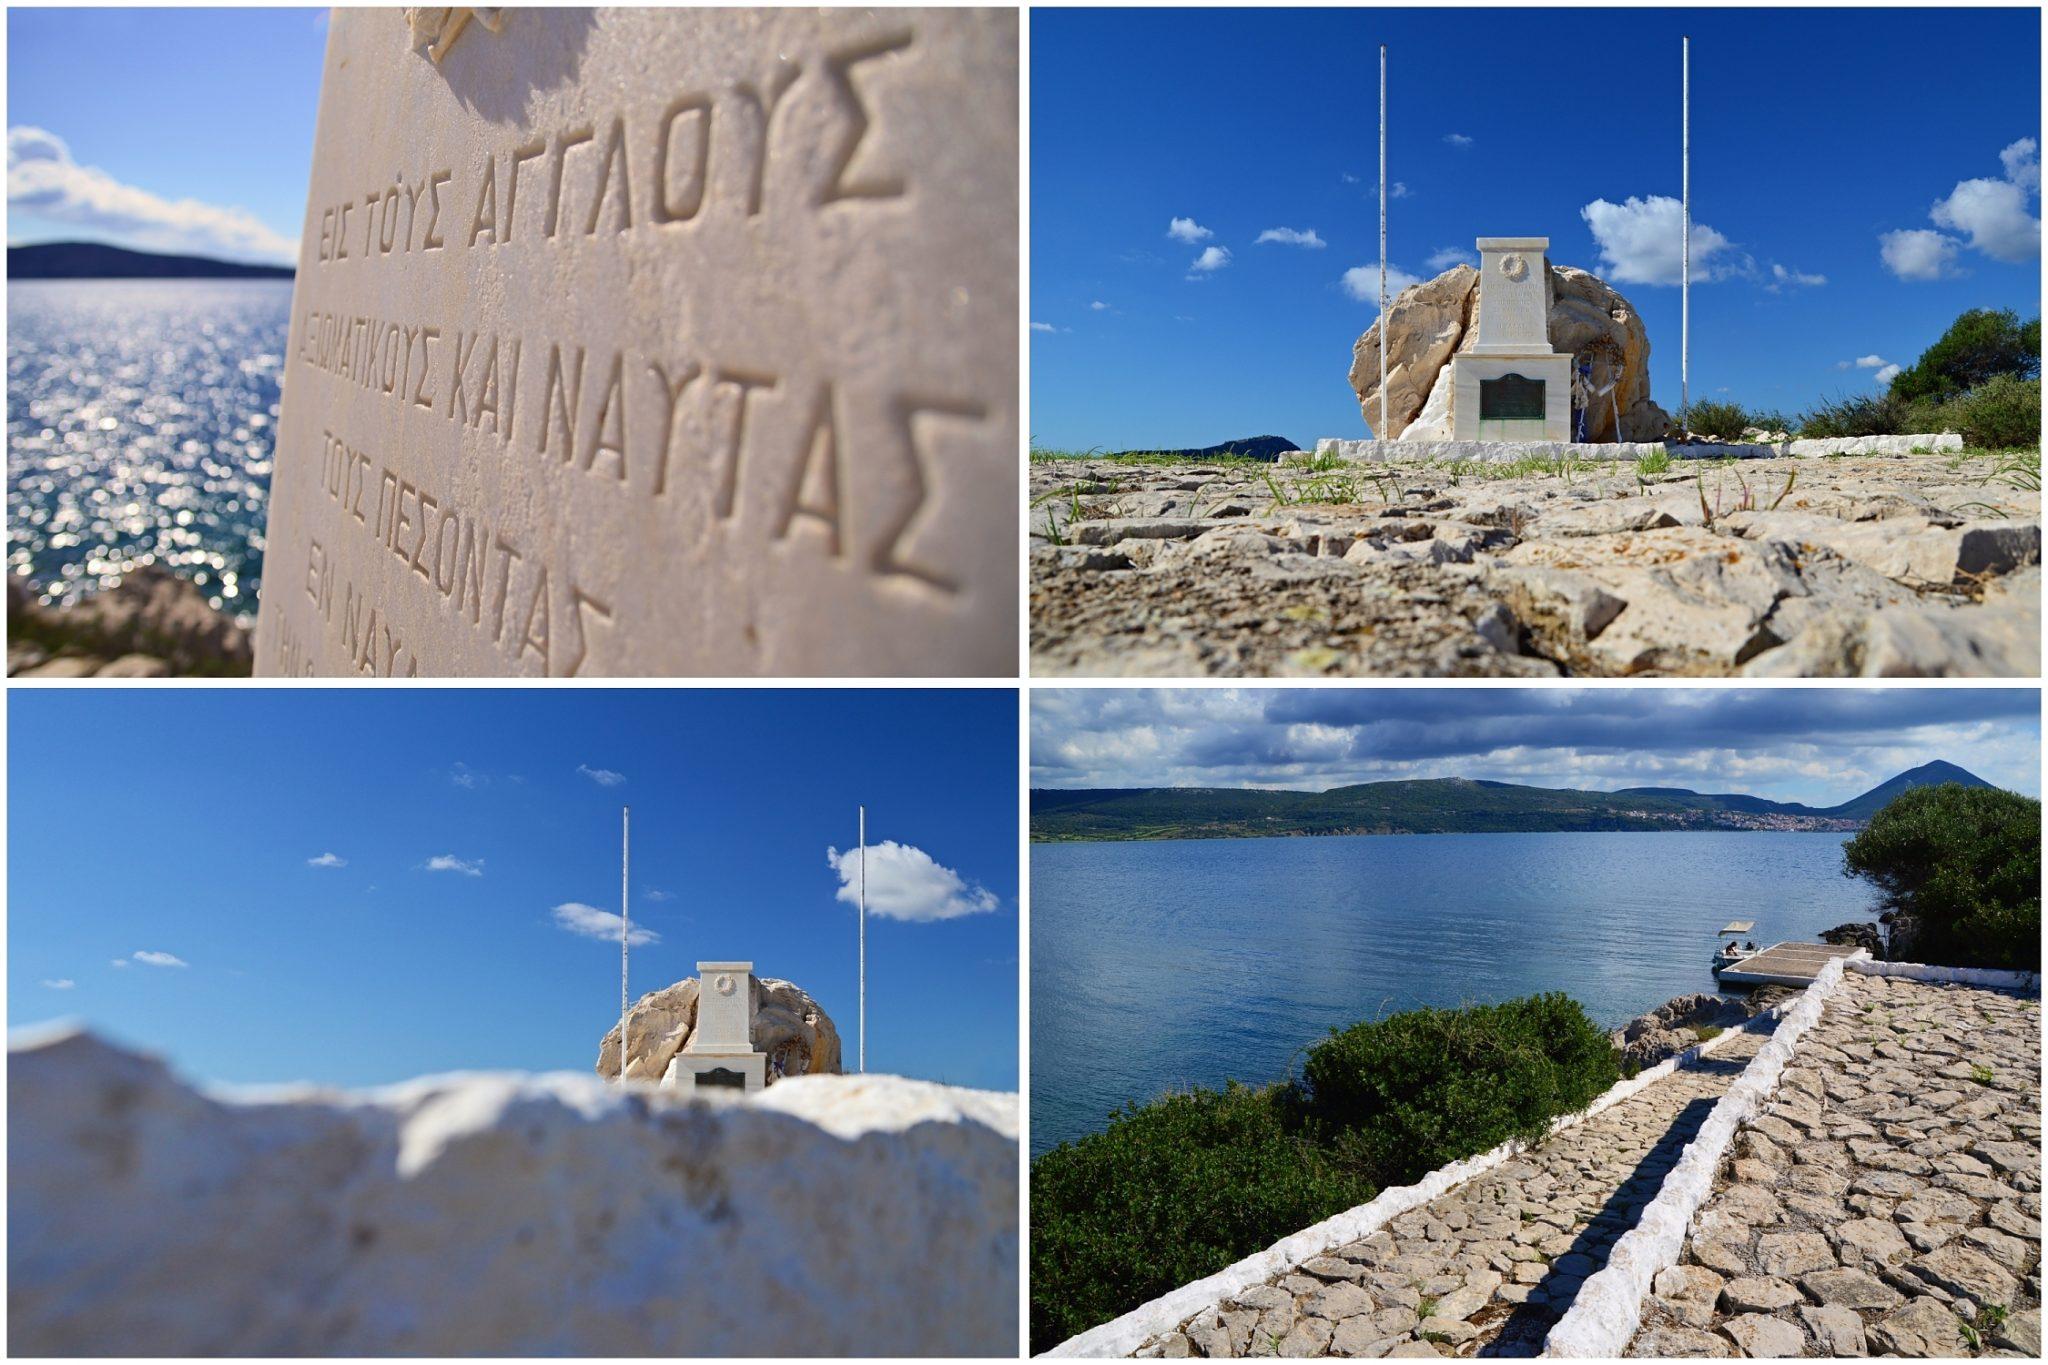 The English Memorial at Chelonaki. Boat trip around the Navarino Bay, Messinia, Greece